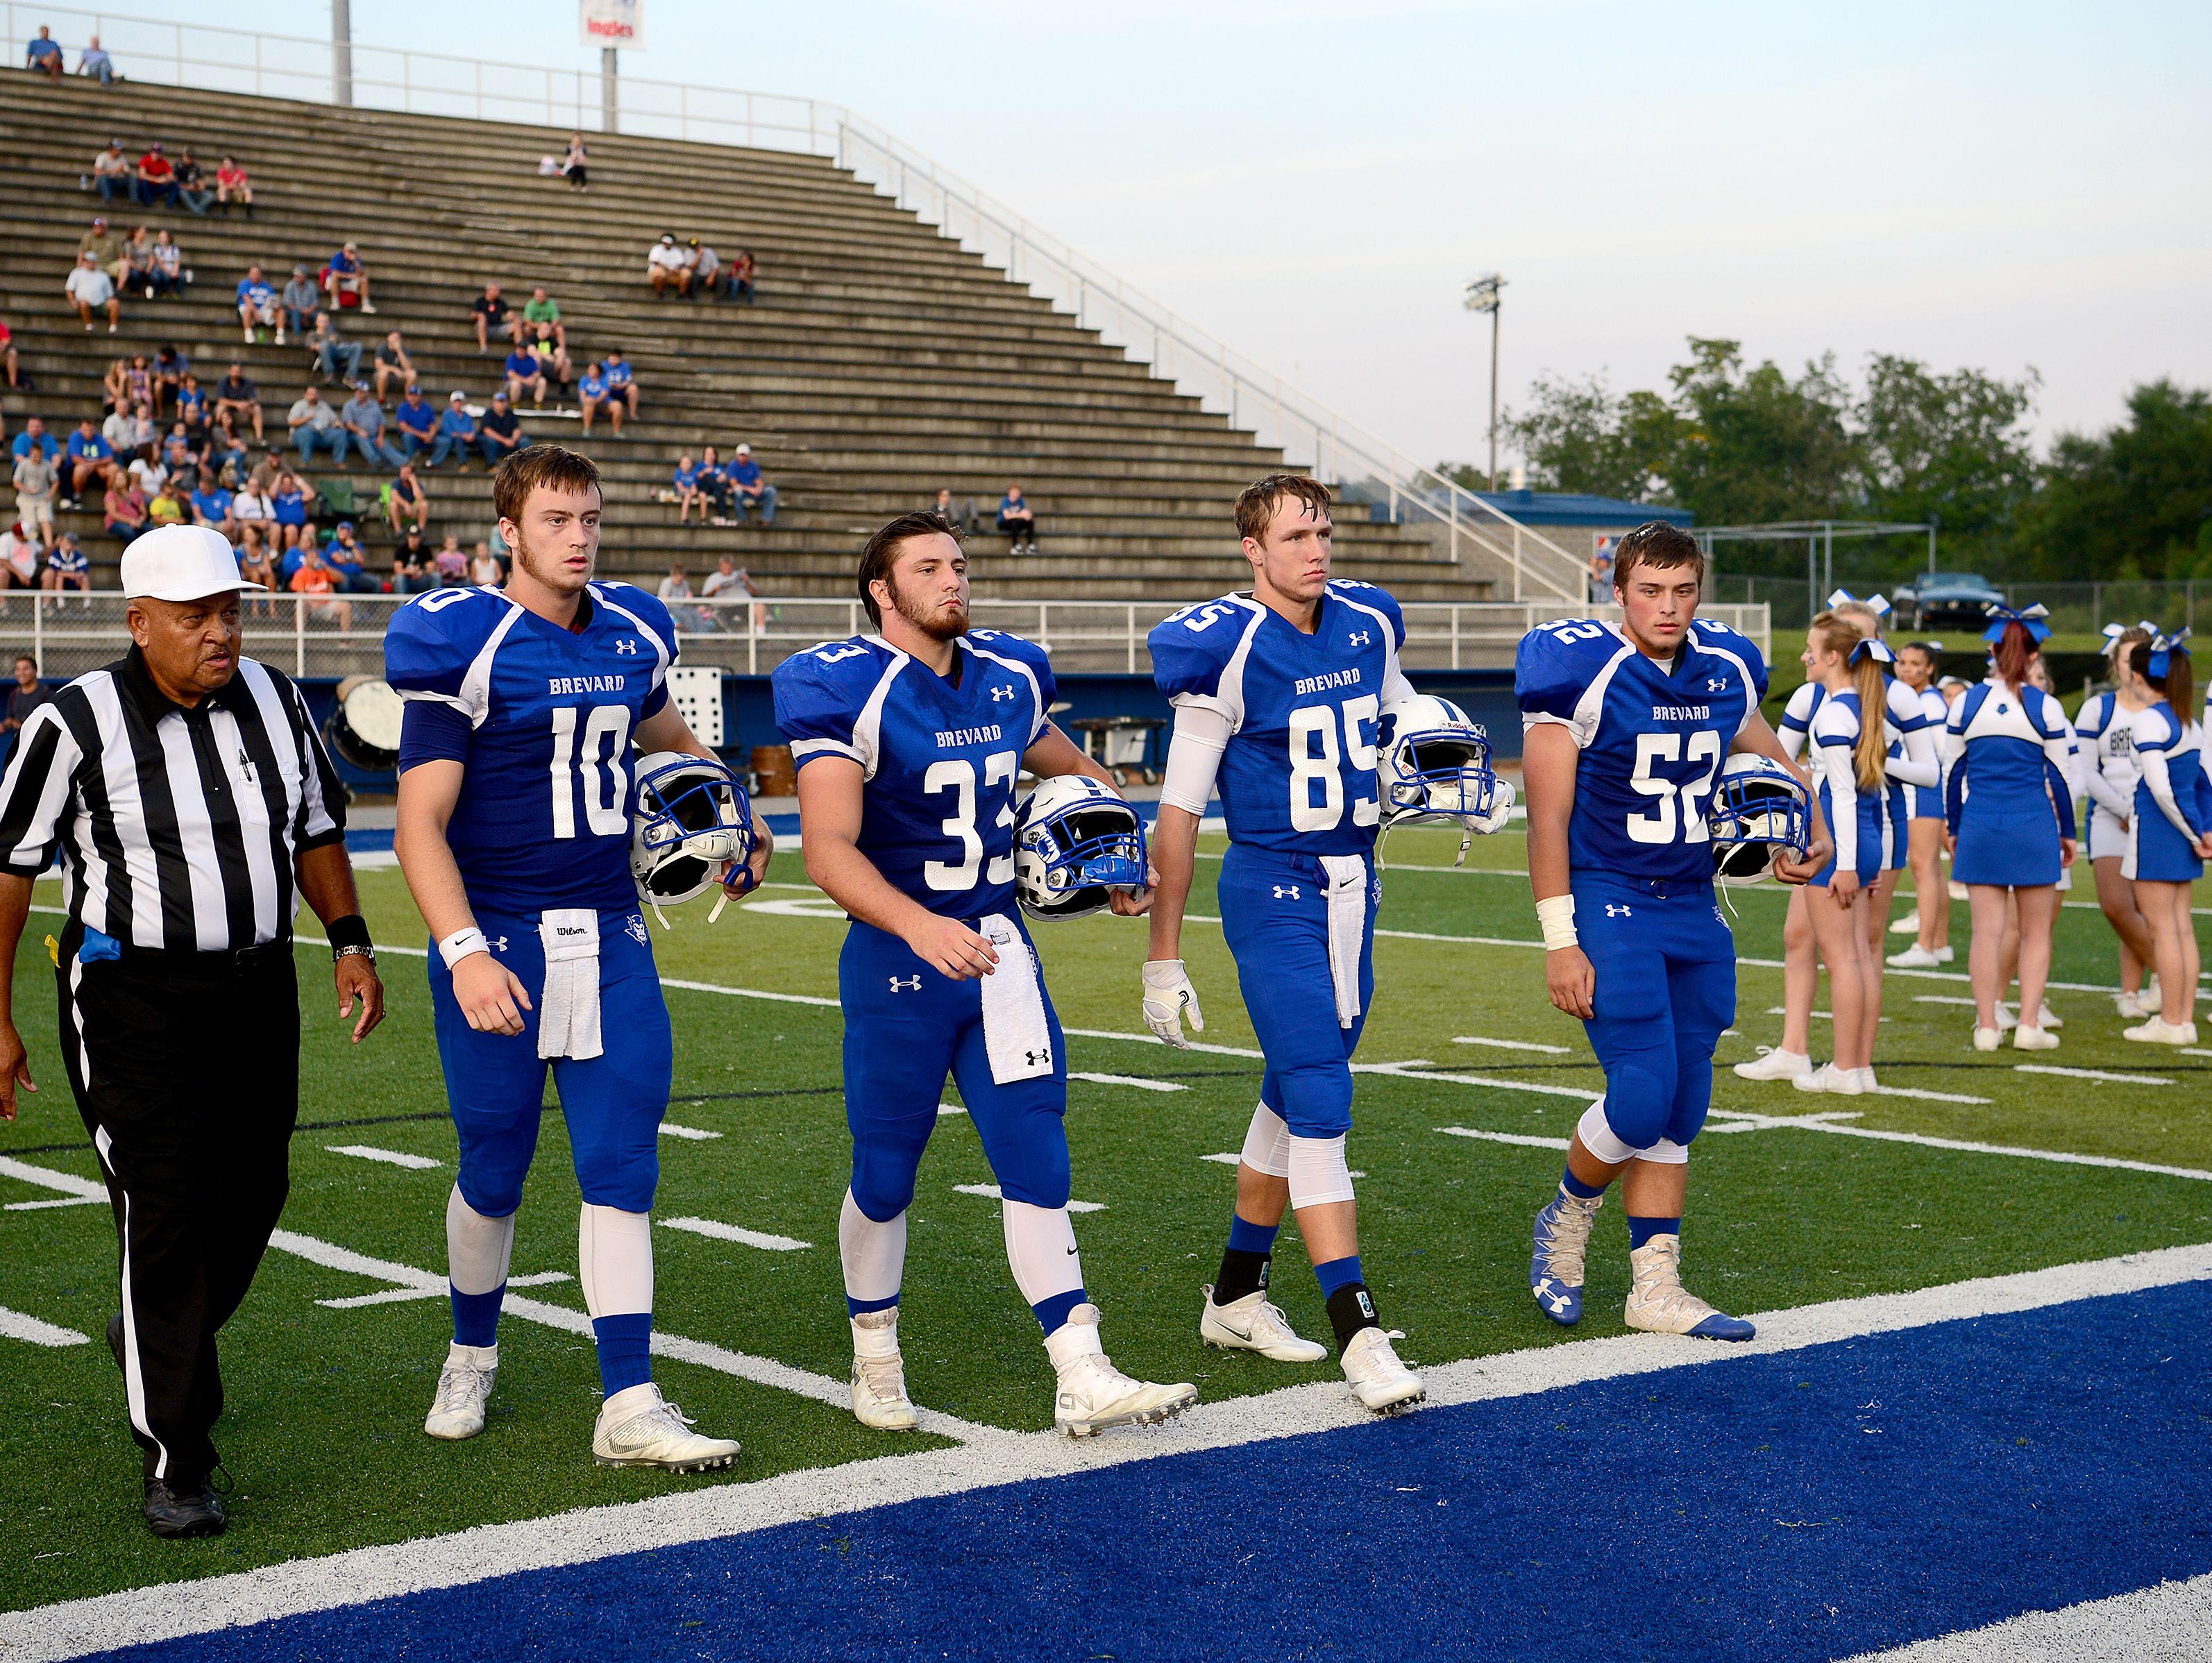 Brevard's team captains.